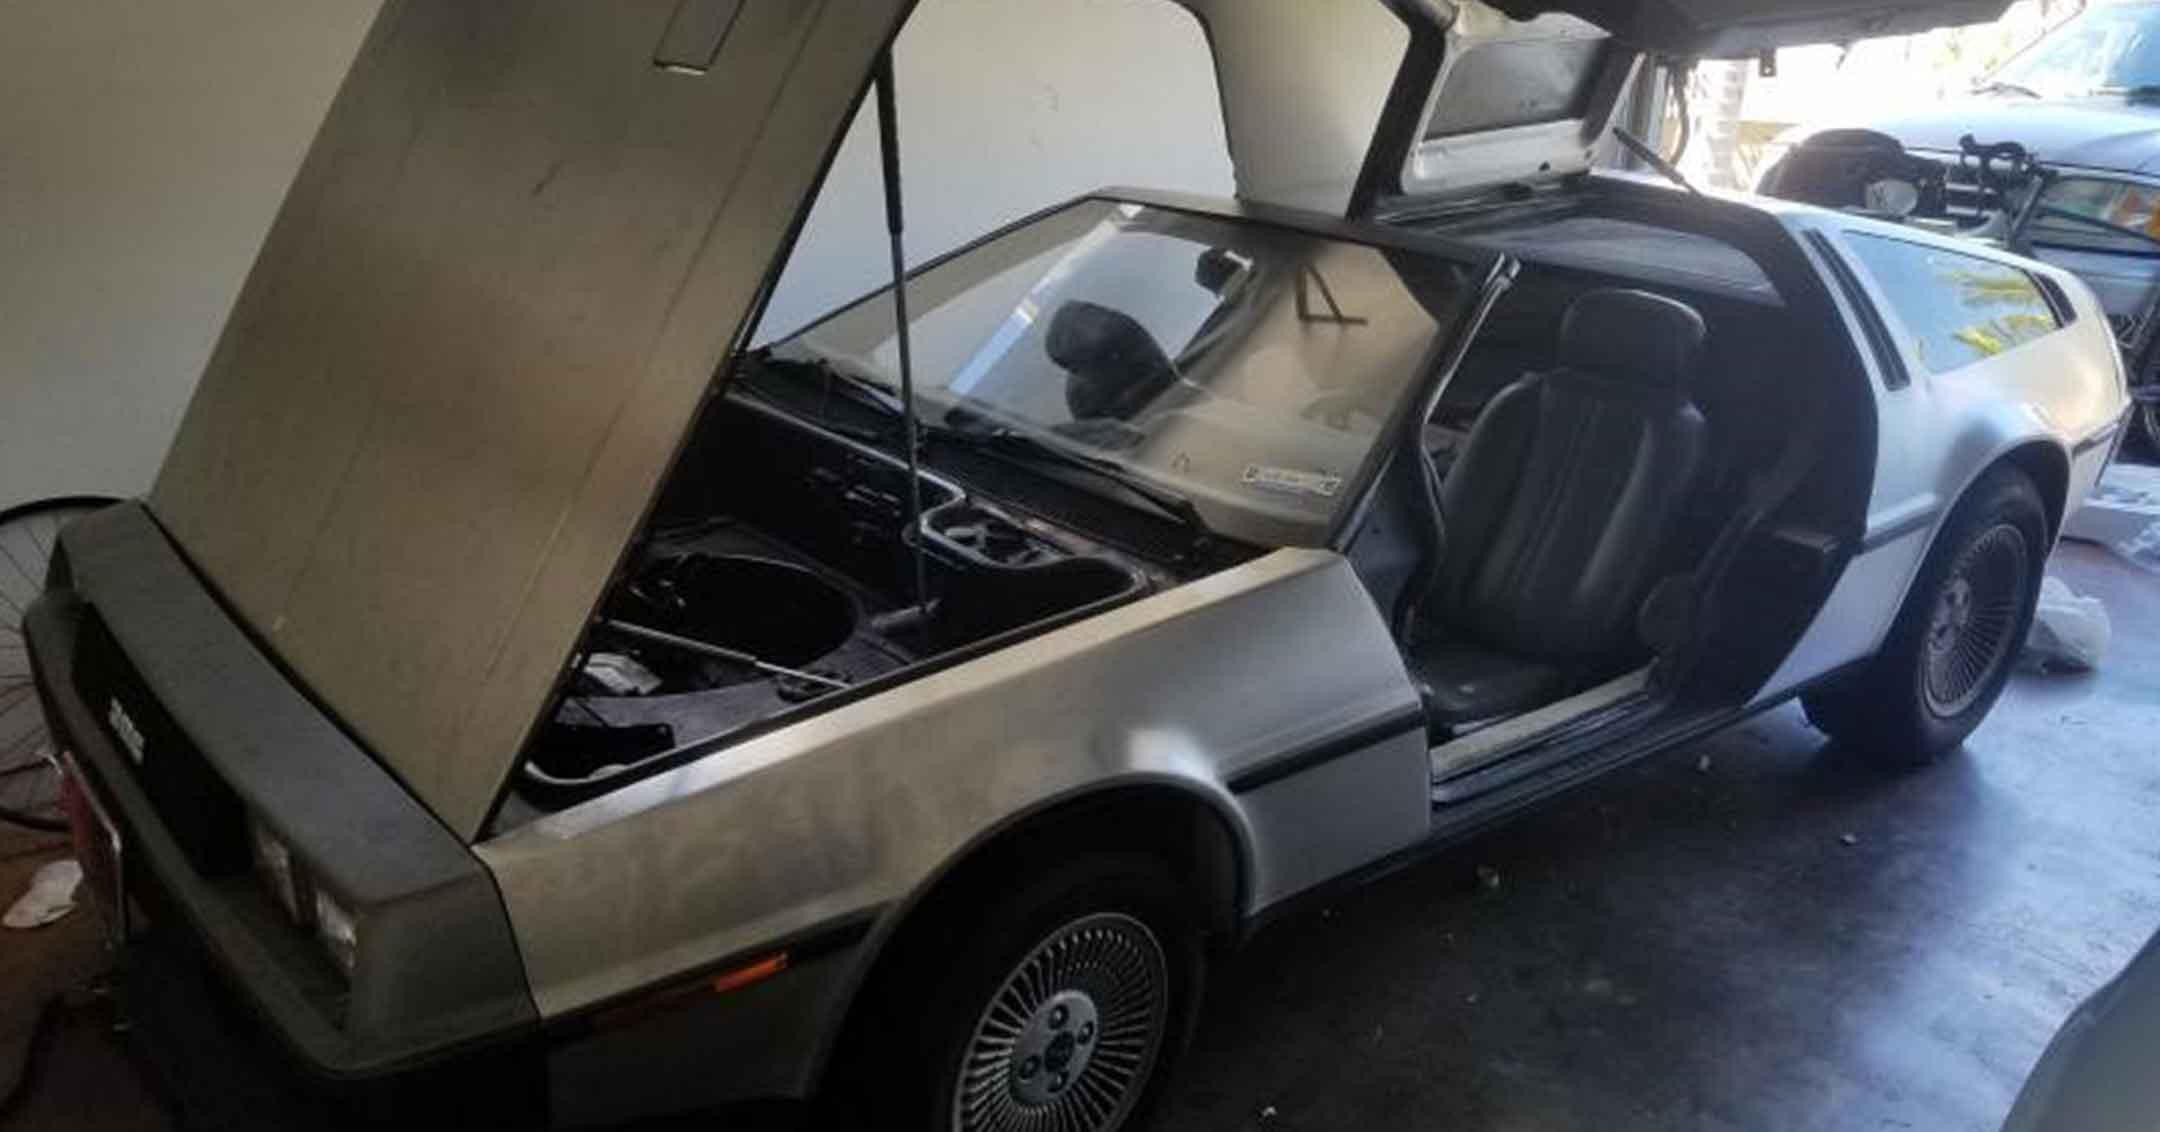 SCEDT26T5BD002995 | DeLoreanDirectory.com